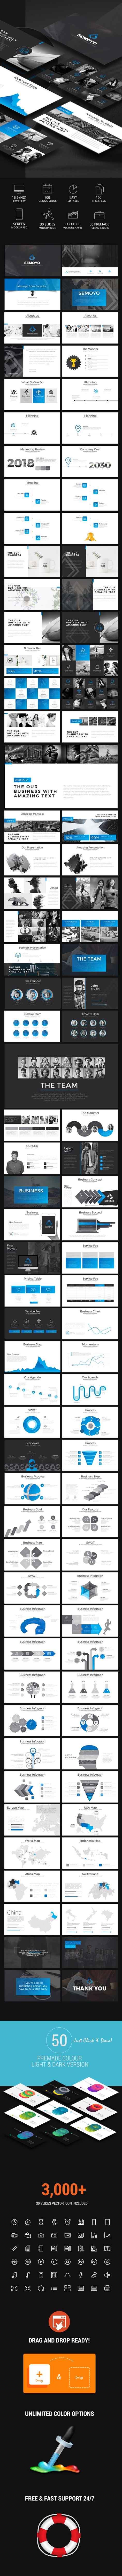 Semoyo PowerPoint. Download: https://graphicriver.net/item/semoyo-powerpoint/19746459?ref=thanhdesign